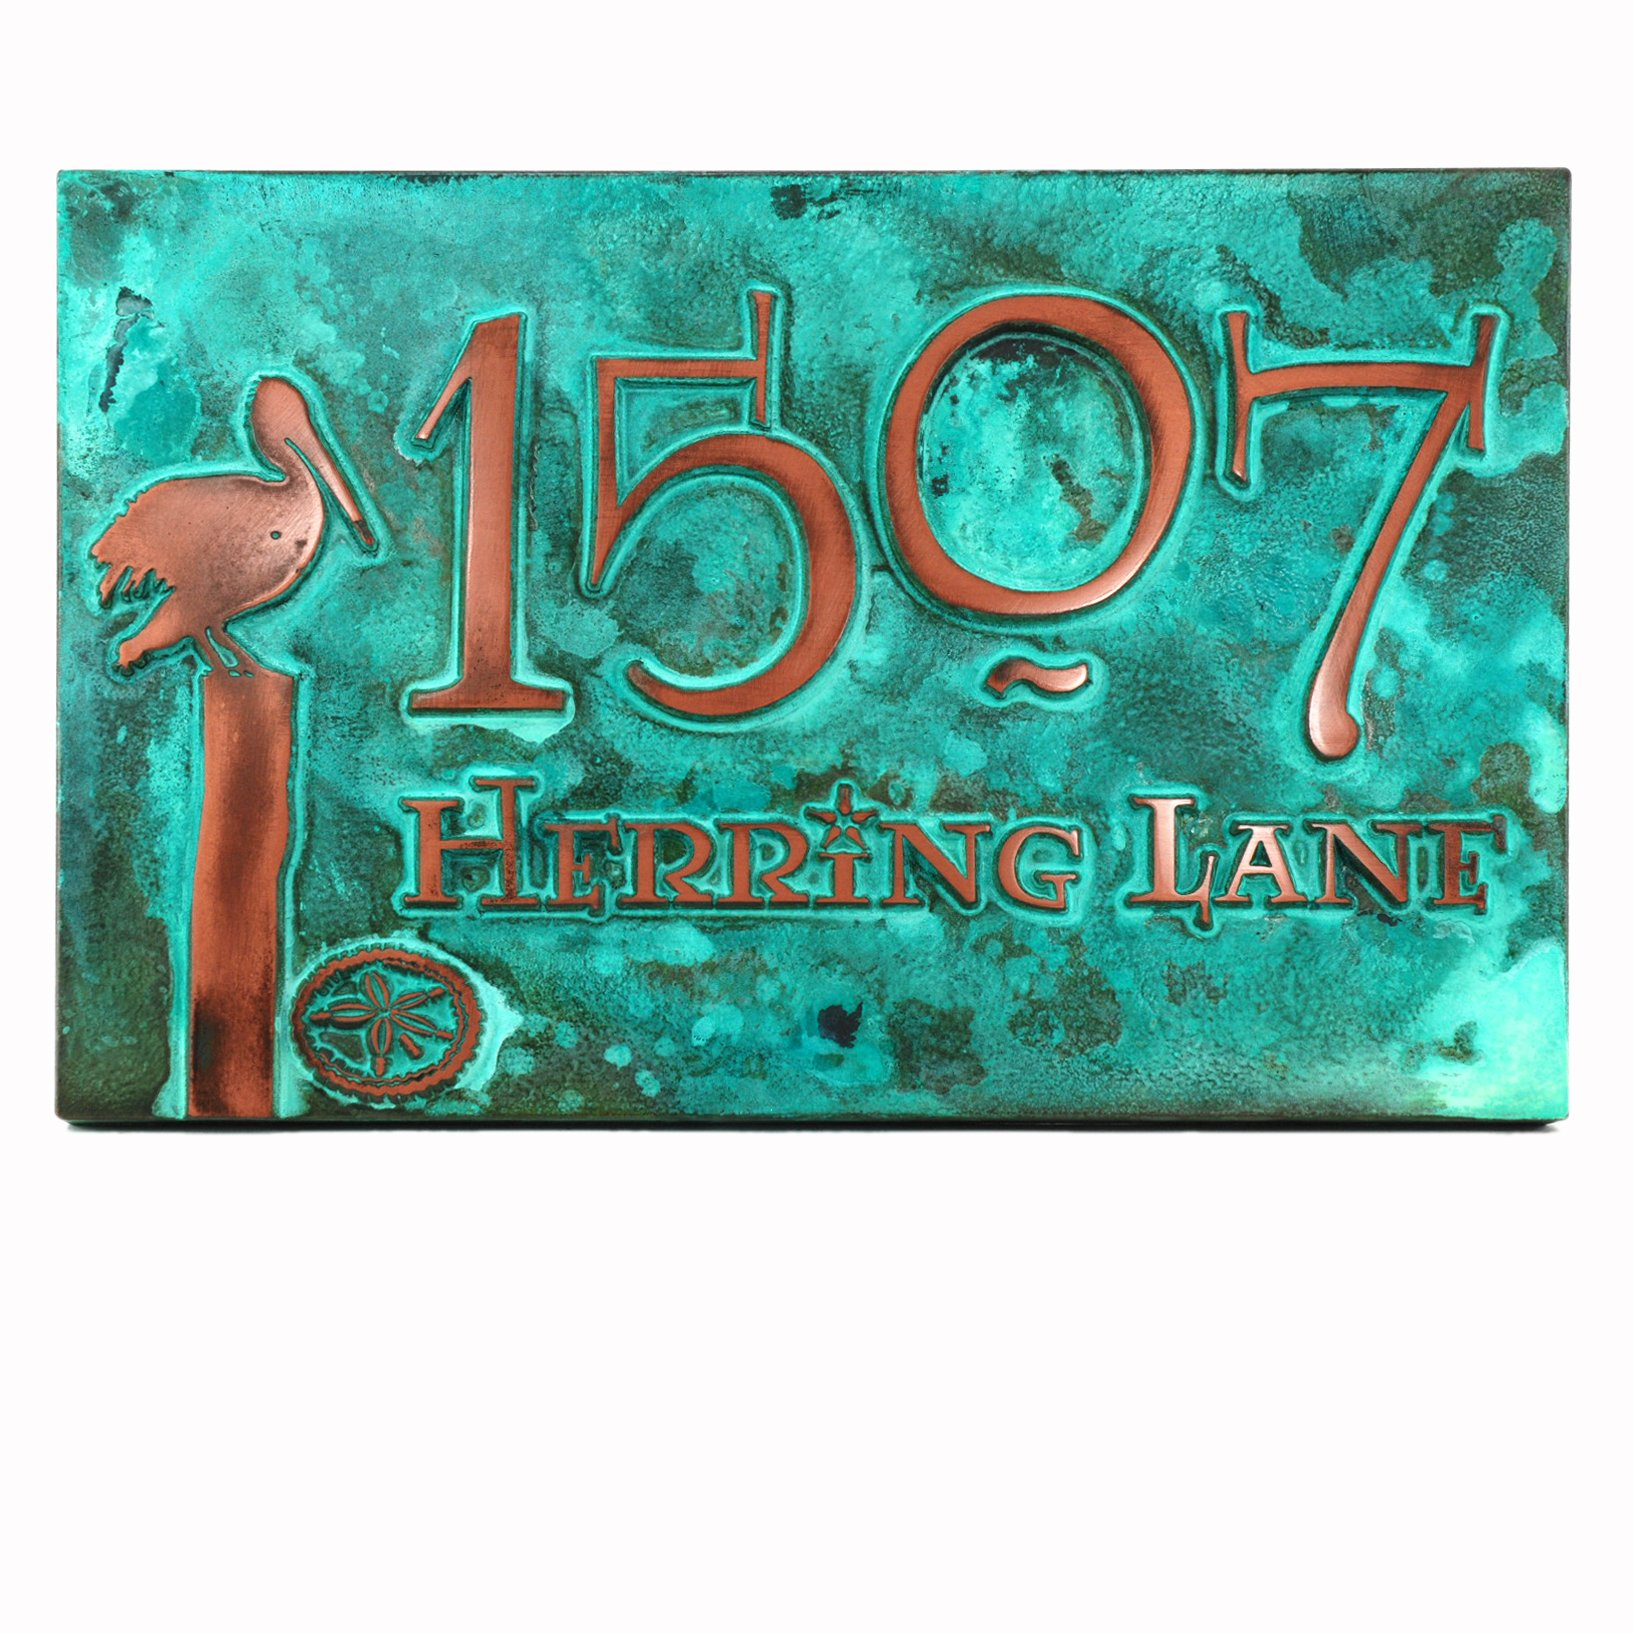 Perched Pelican Address Plaque 16x10.5 - Raised Copper Verdi Metal Coated Sign